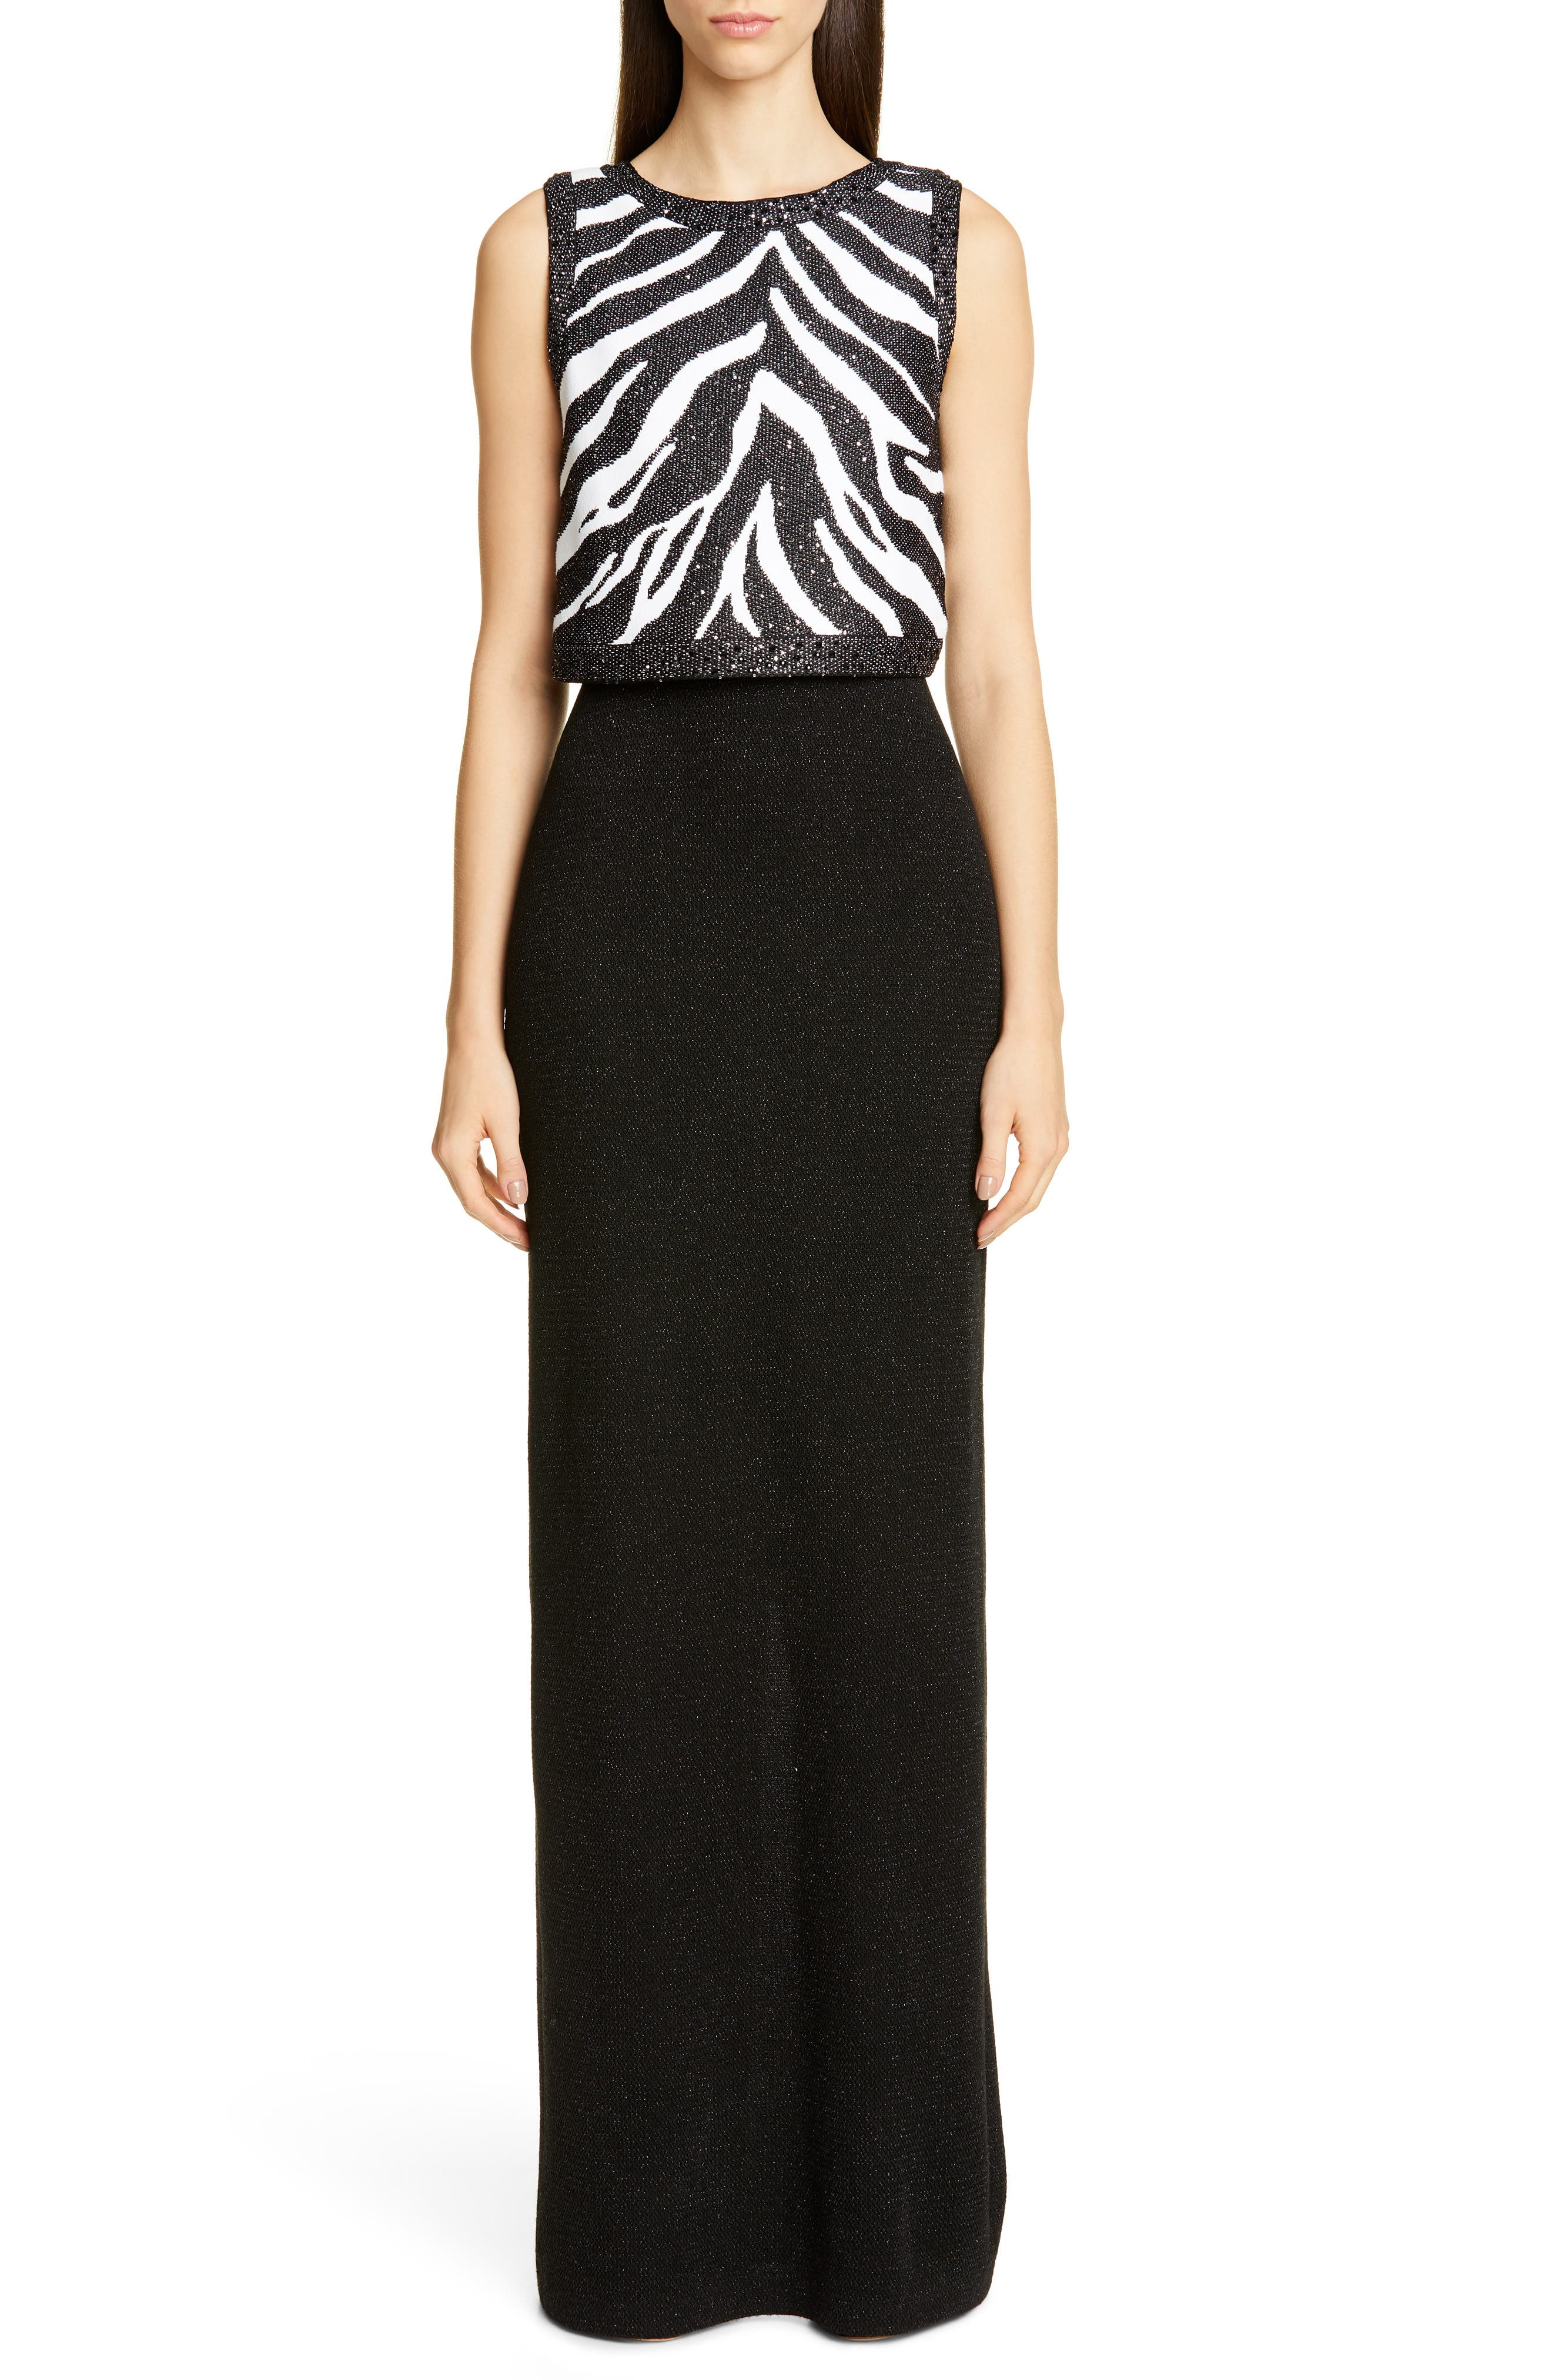 St. John Collection Sequin Zebra Jacquard Knit Column Gown, Black